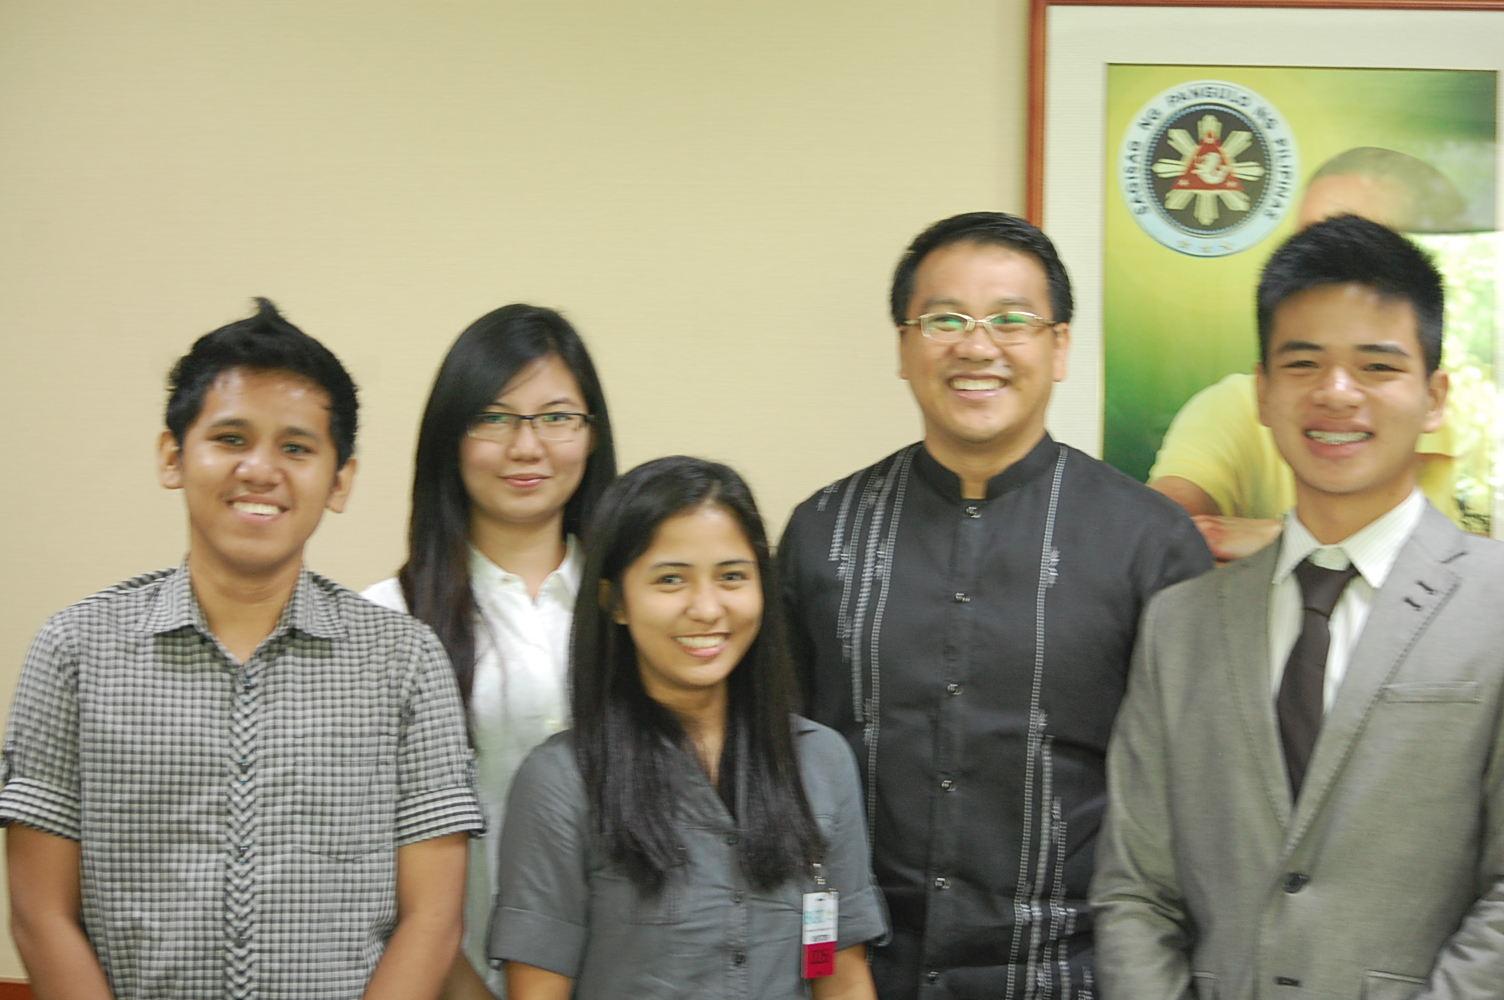 Edukasyon.ph intern Irah Zapanta interviews CEO of BCDA Arnel Casanova.